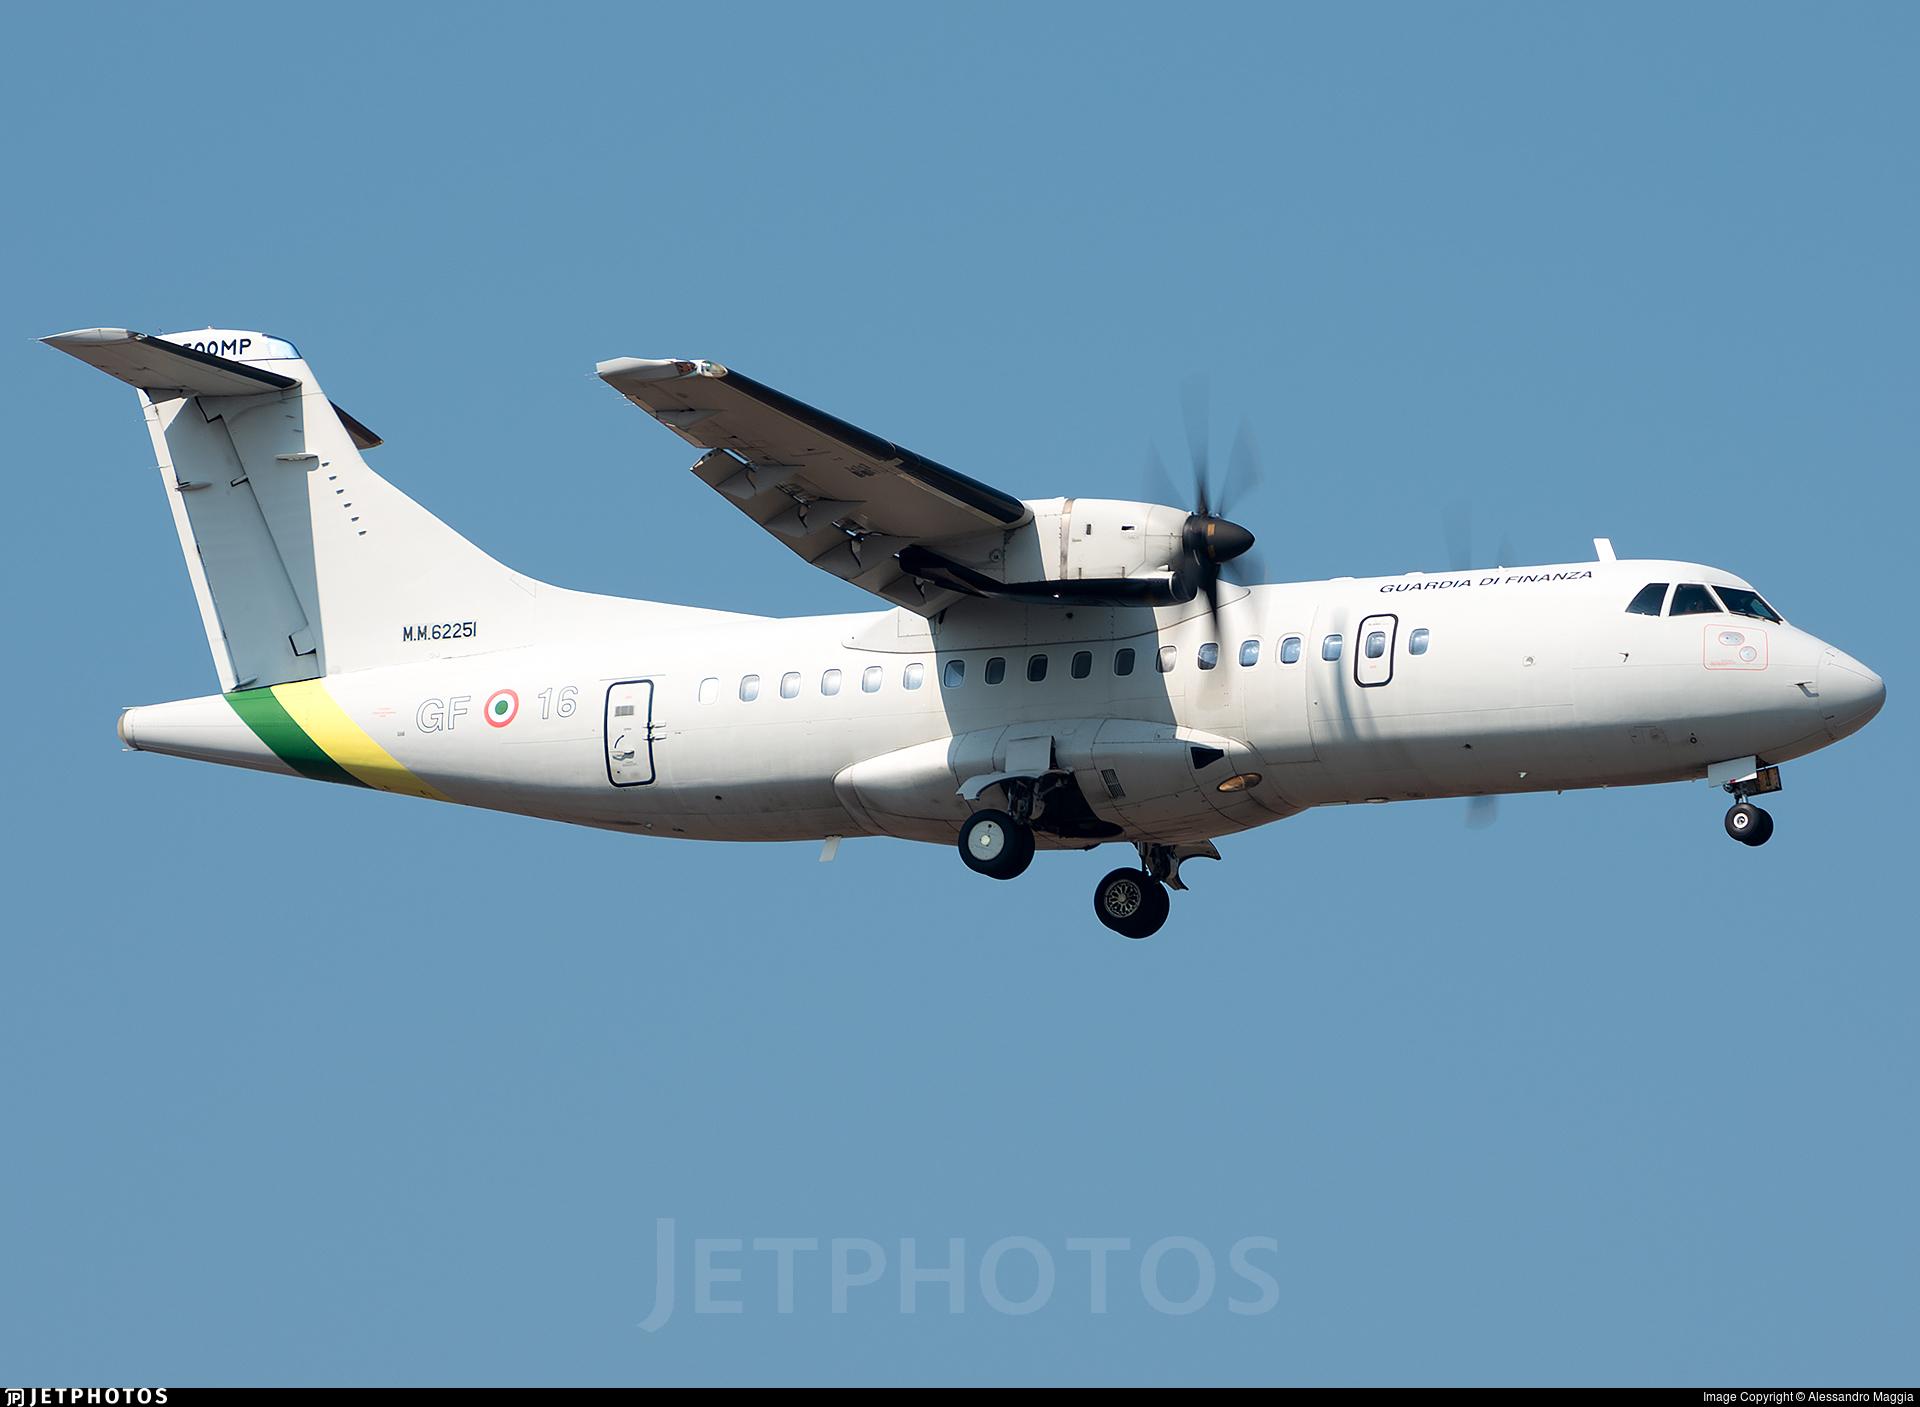 MM62251 - ATR 42-500MP Surveyor - Italy - Guardia di Finanza